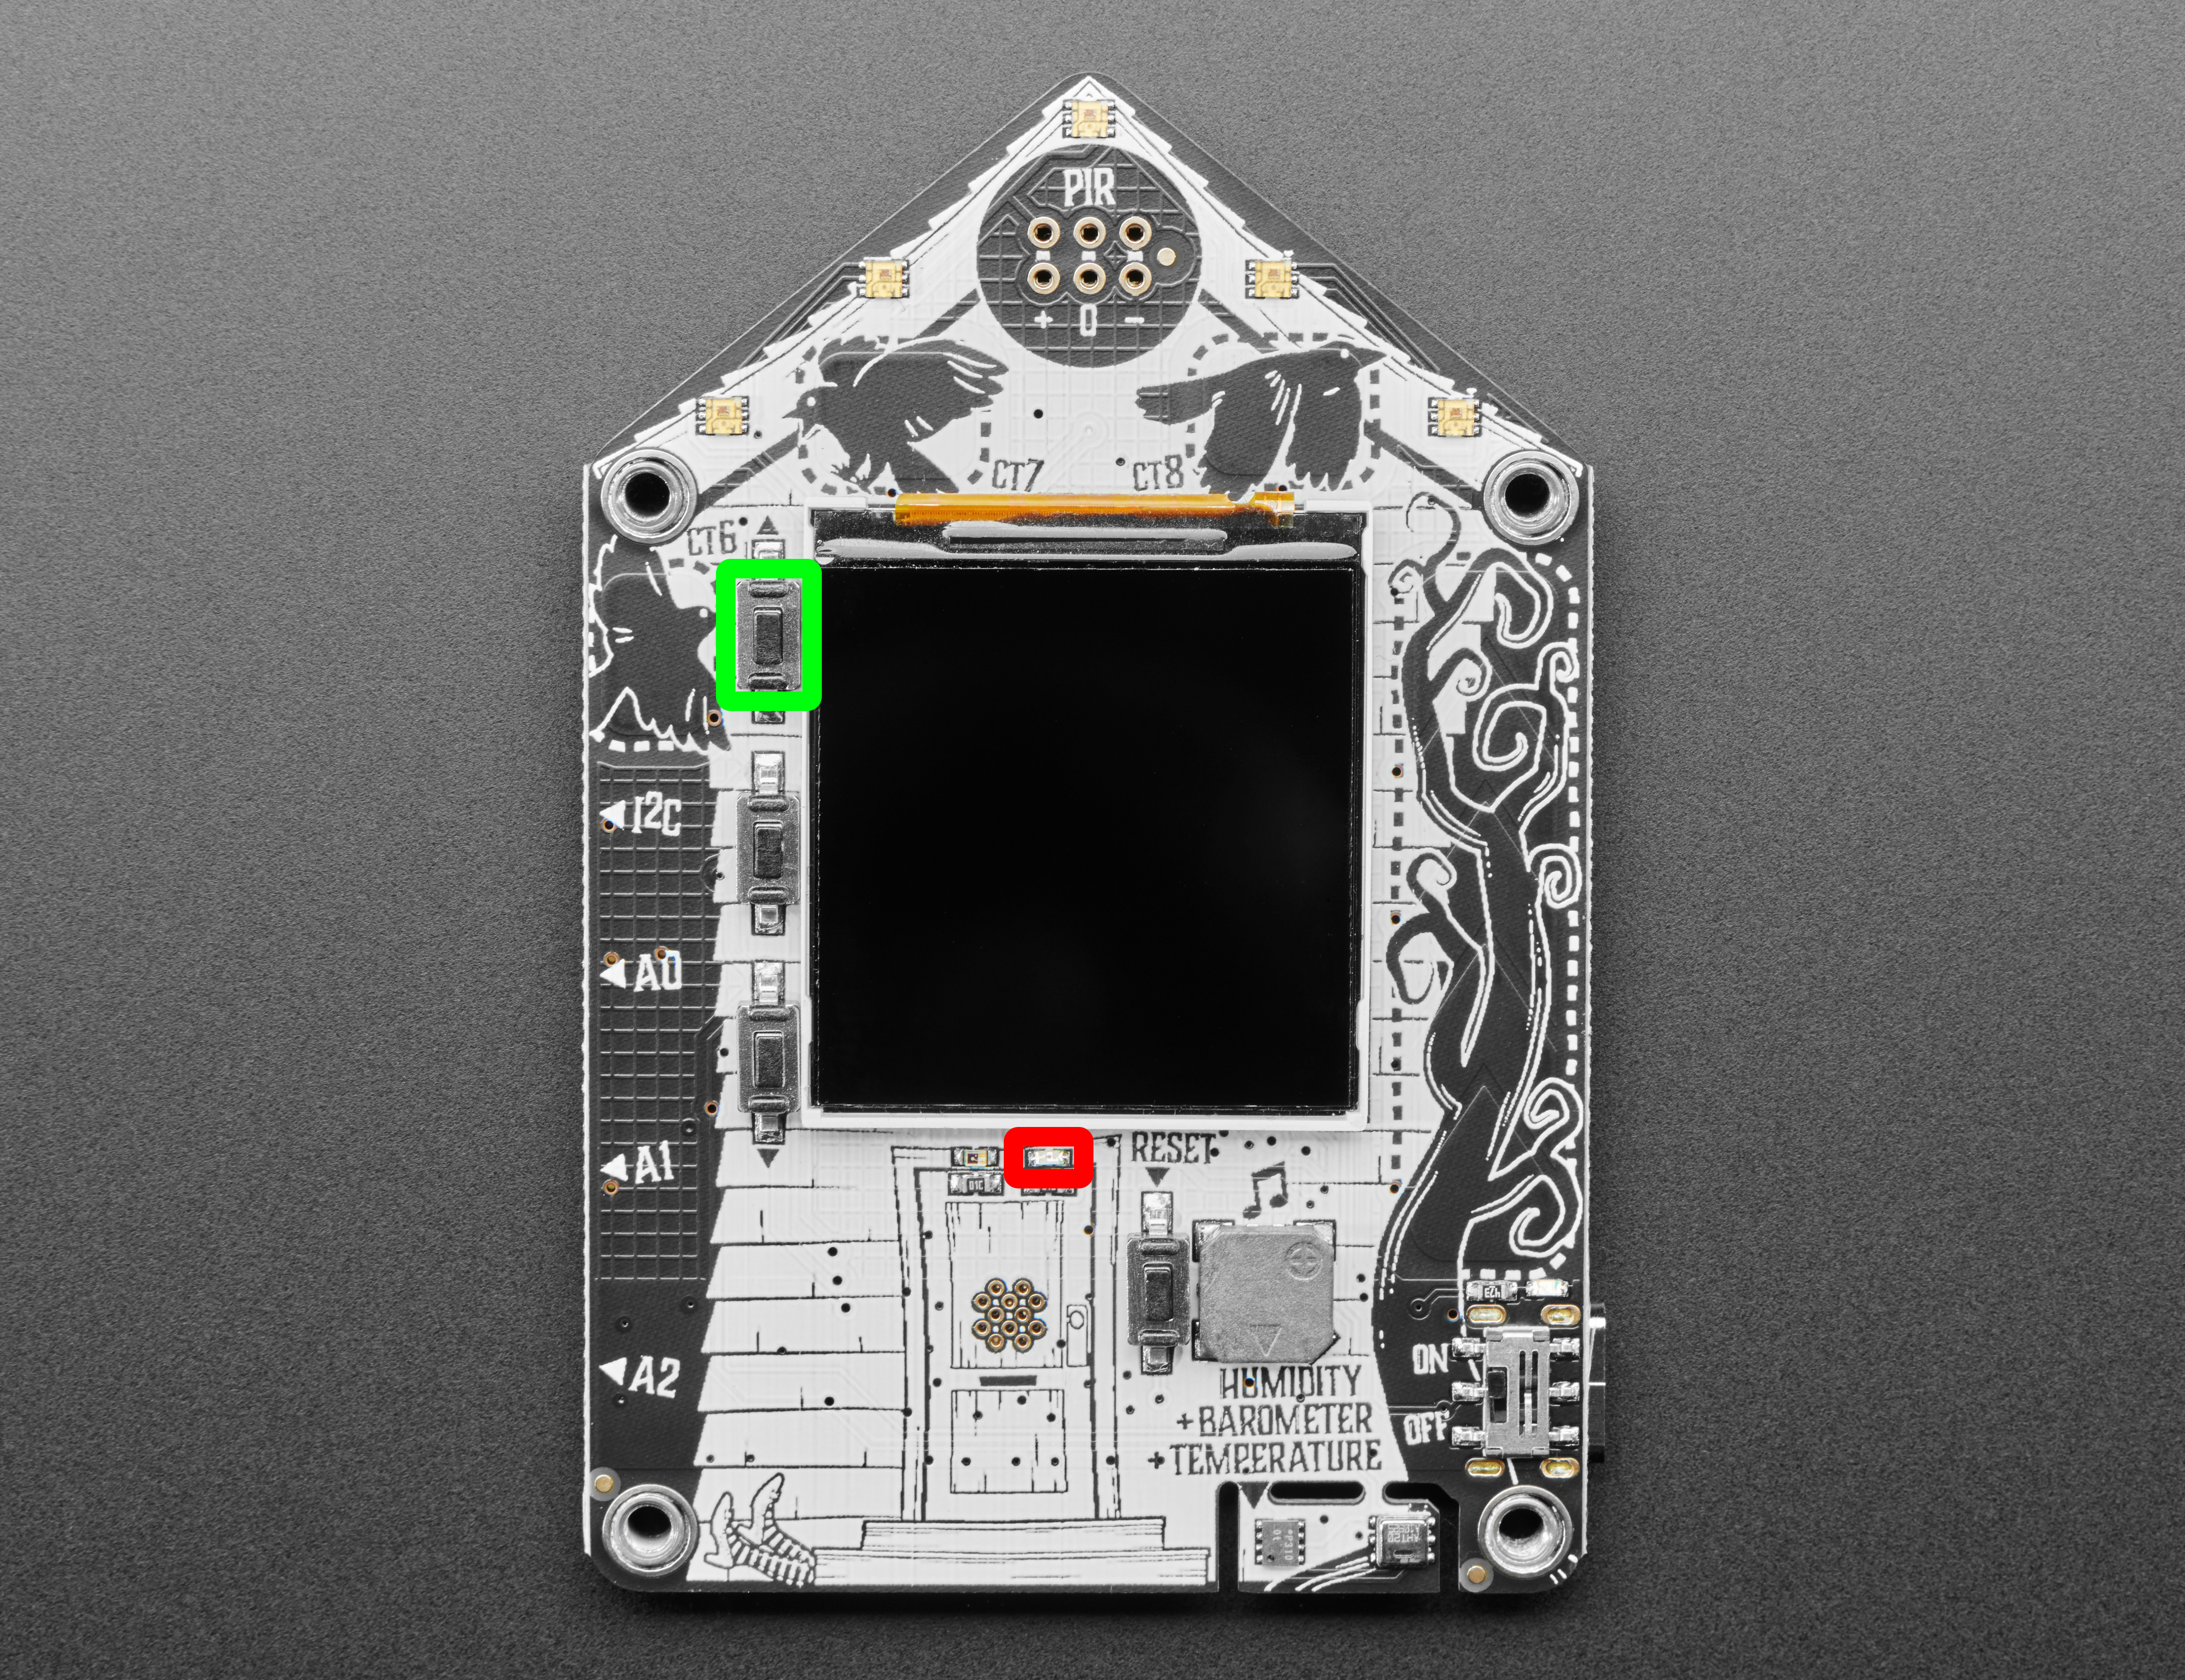 new_component__digital_input__sensors_FunHouse_red_led_button.jpeg